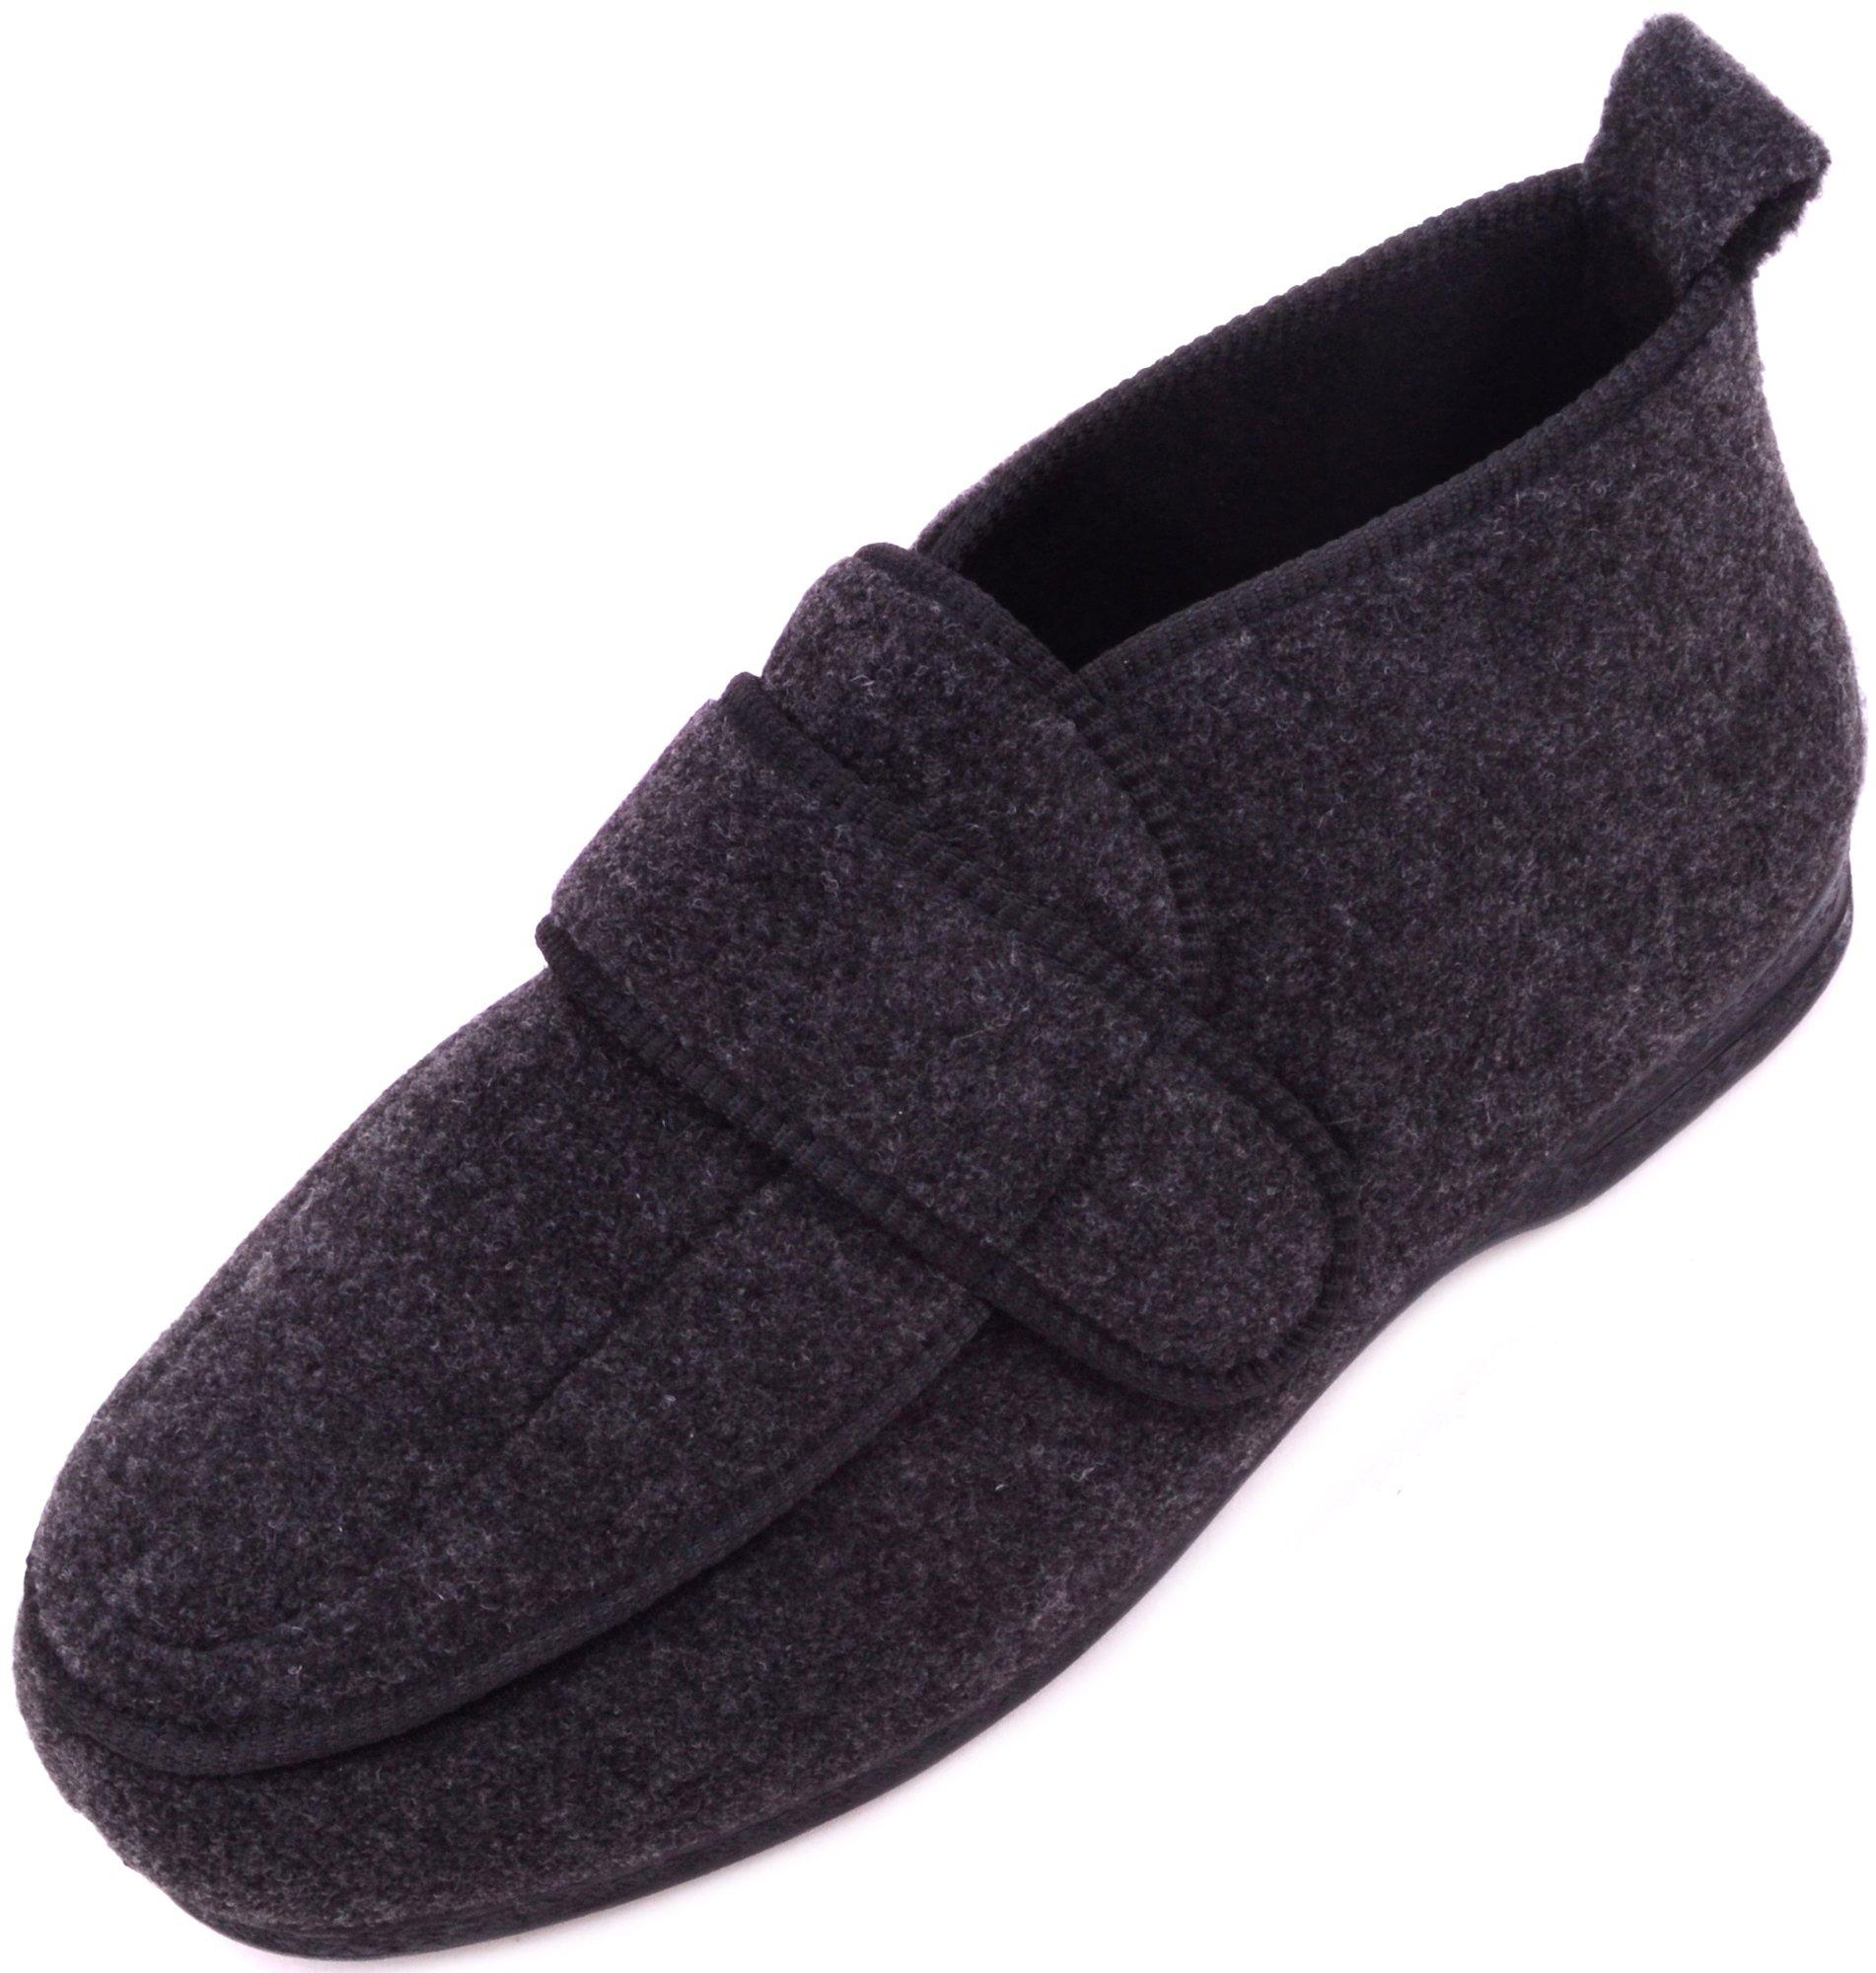 Mens Orthopaedic / EEE Wide Fit Adjustable Velcro Slipper Boot / Slippers - Charcoal - US 8